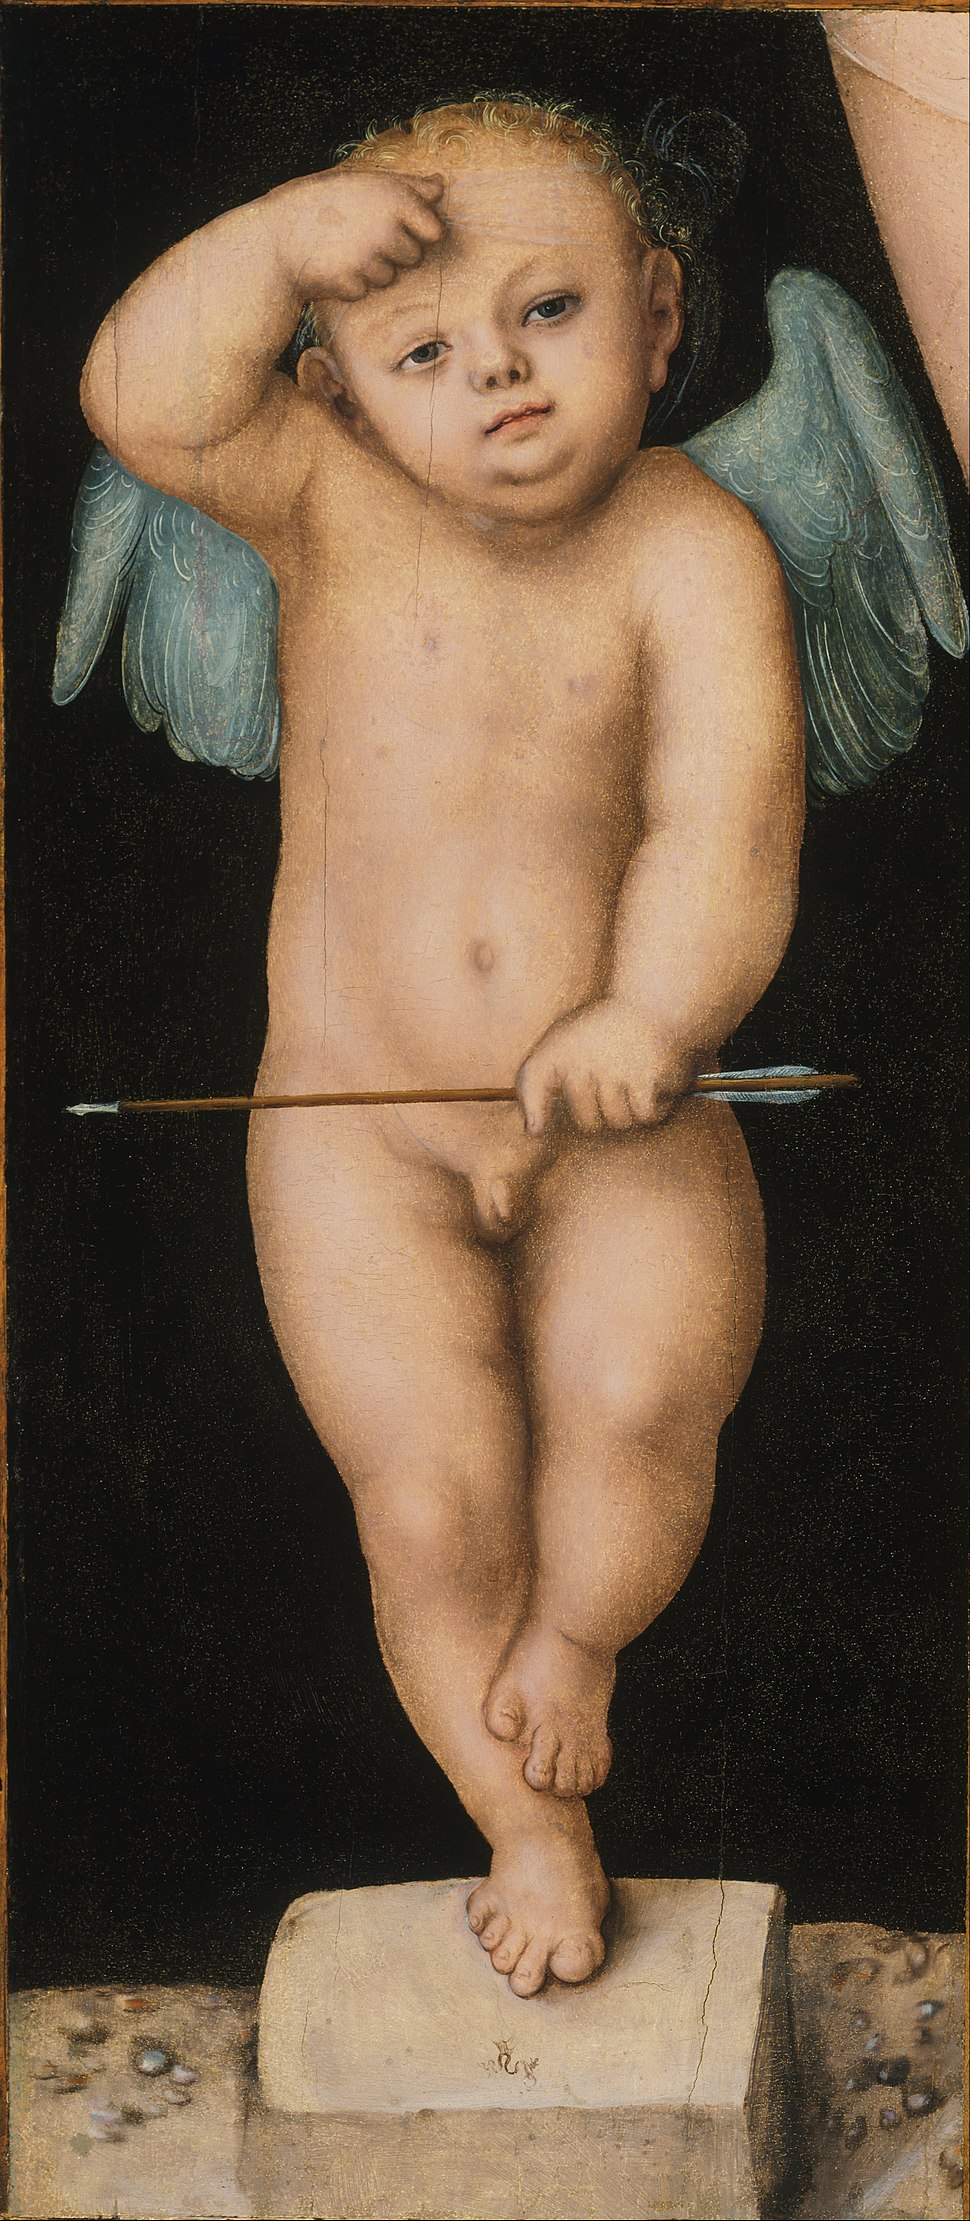 Lucas Cranach the Elder, German (active Vienna, Wittenberg, and Weimar) - Cupid - Google Art Project.jpg